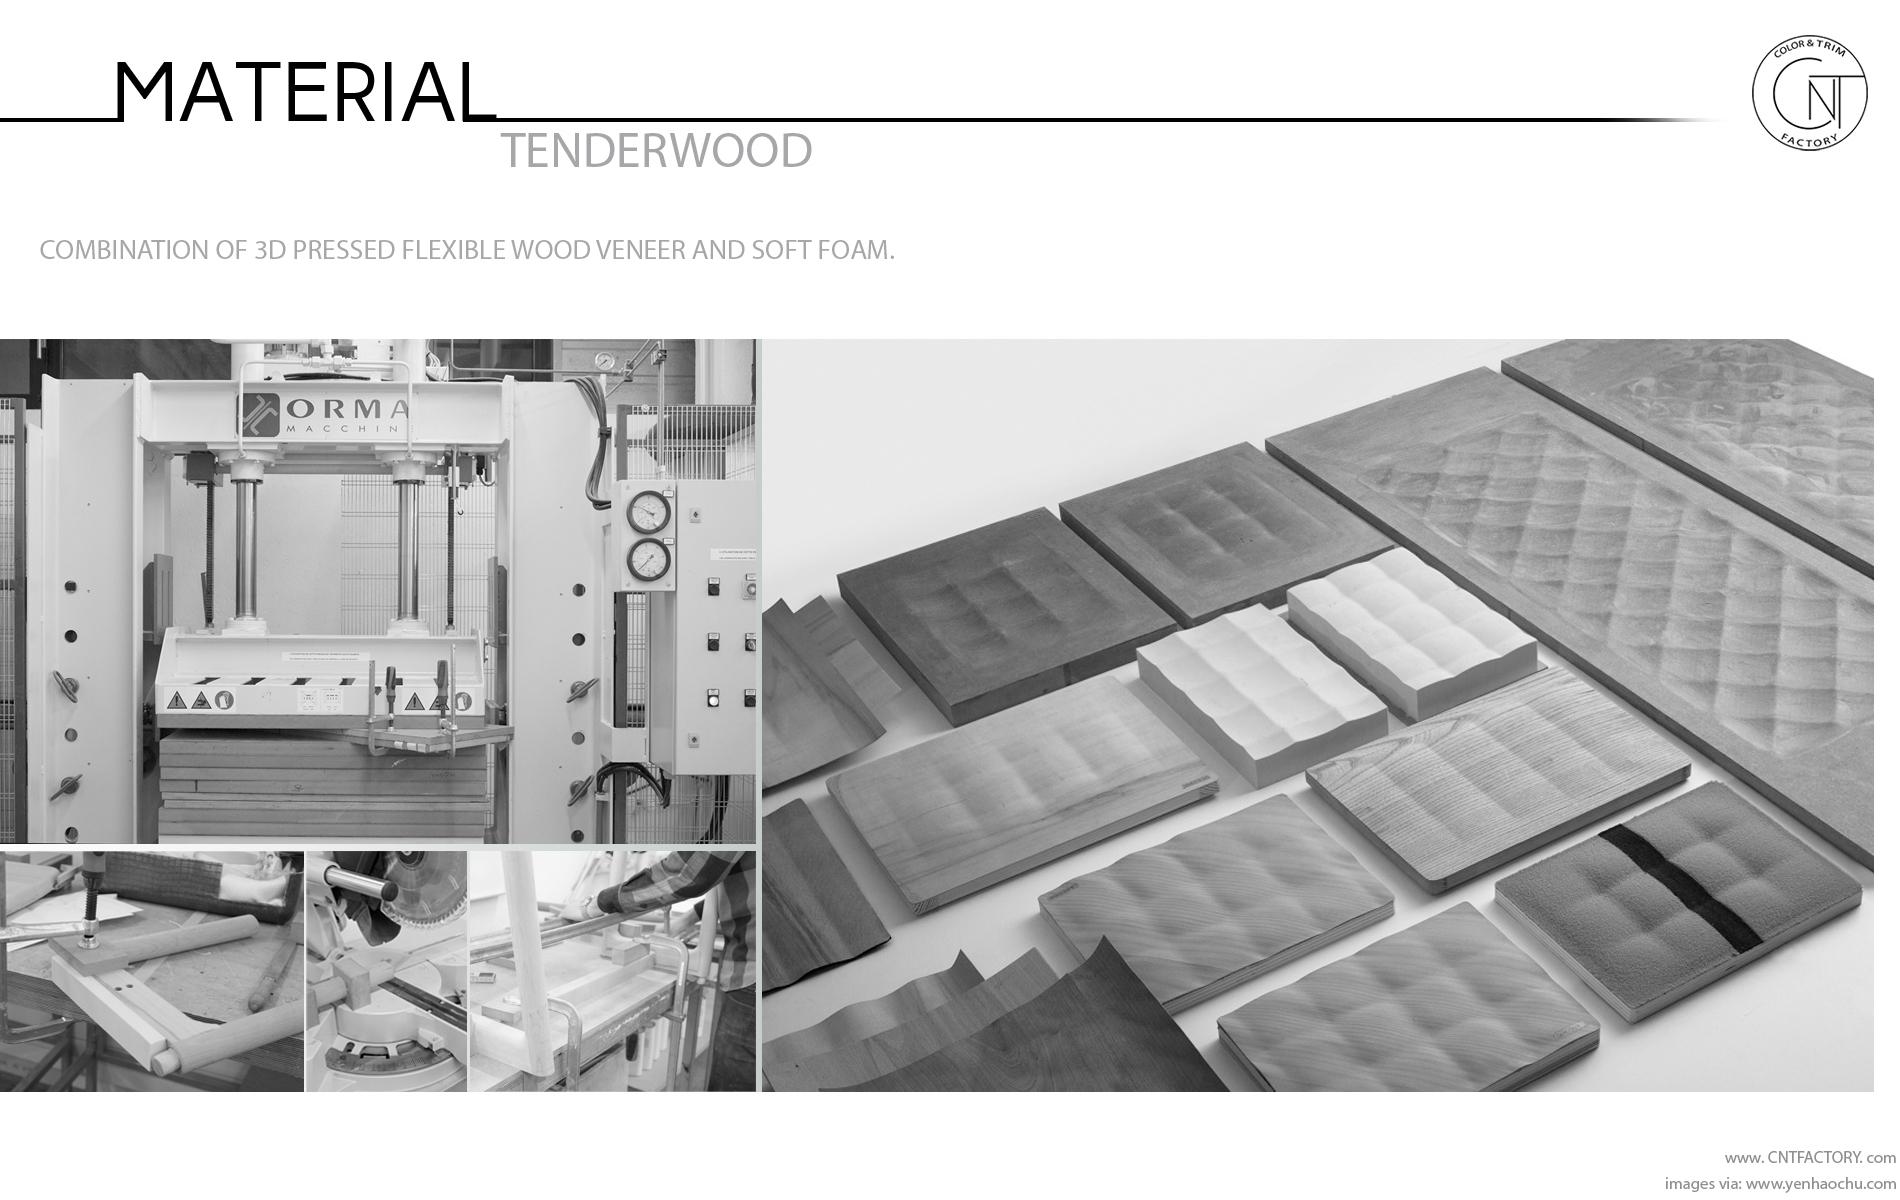 Tenderwood Soft Wood Treatment